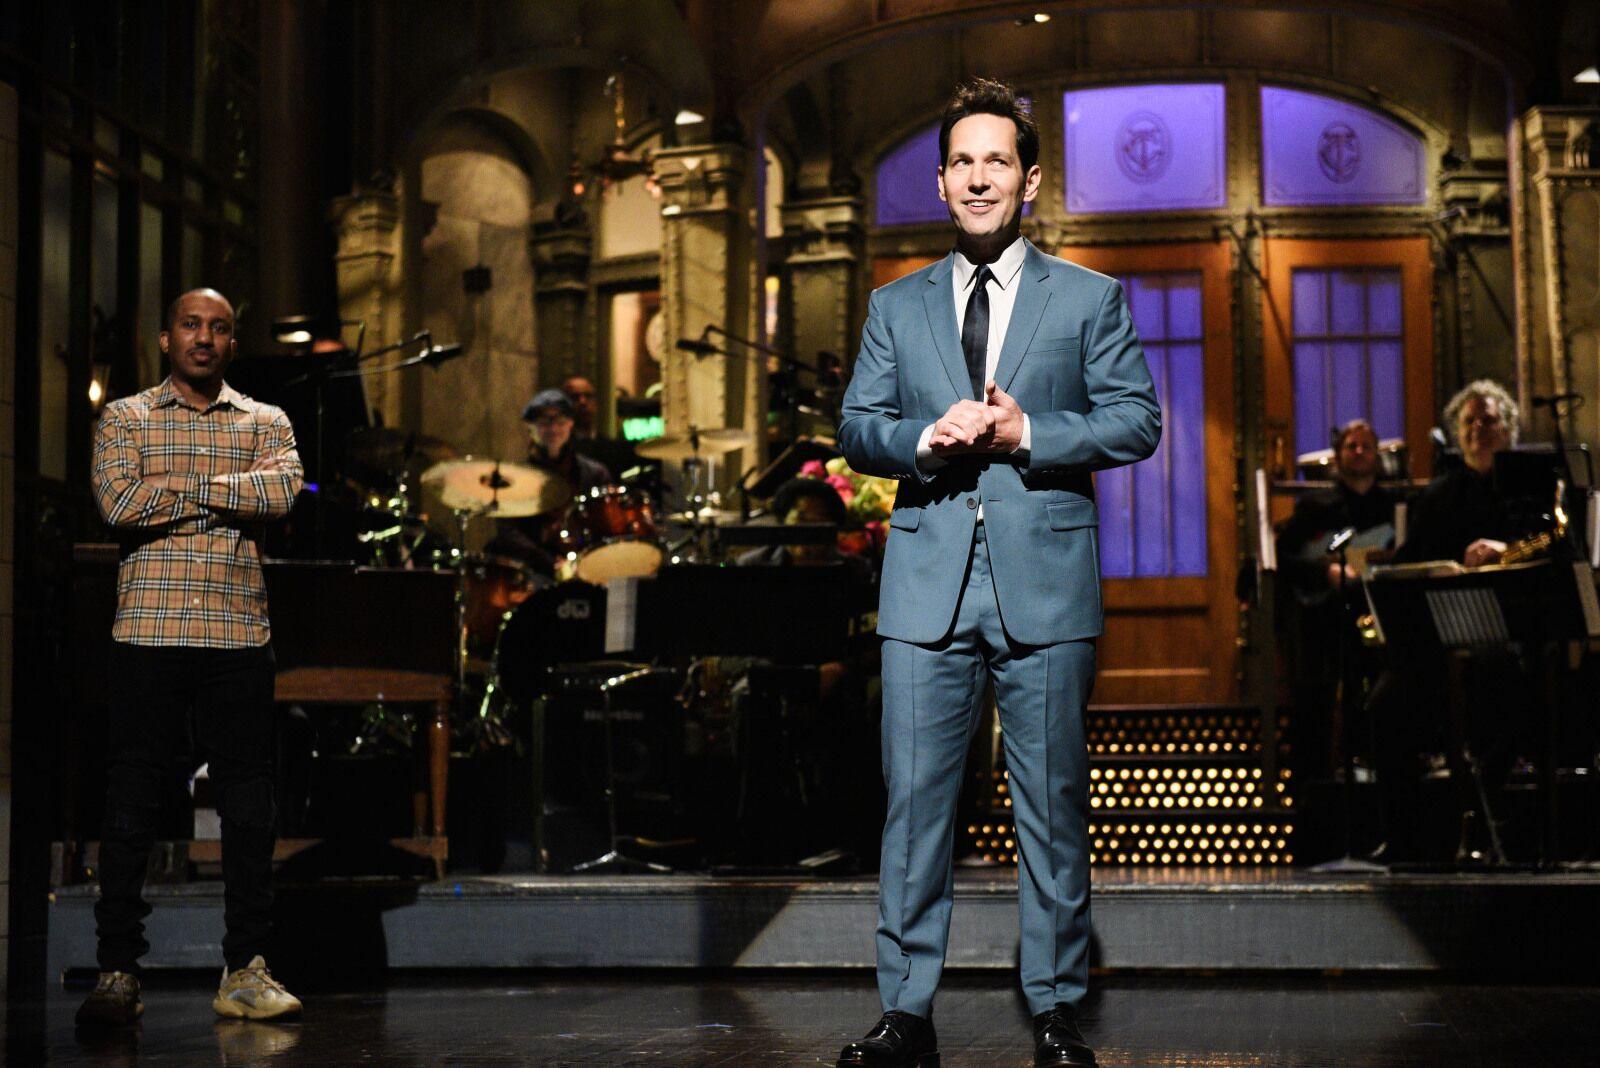 Is Saturday Night Live new tonight, May 25?